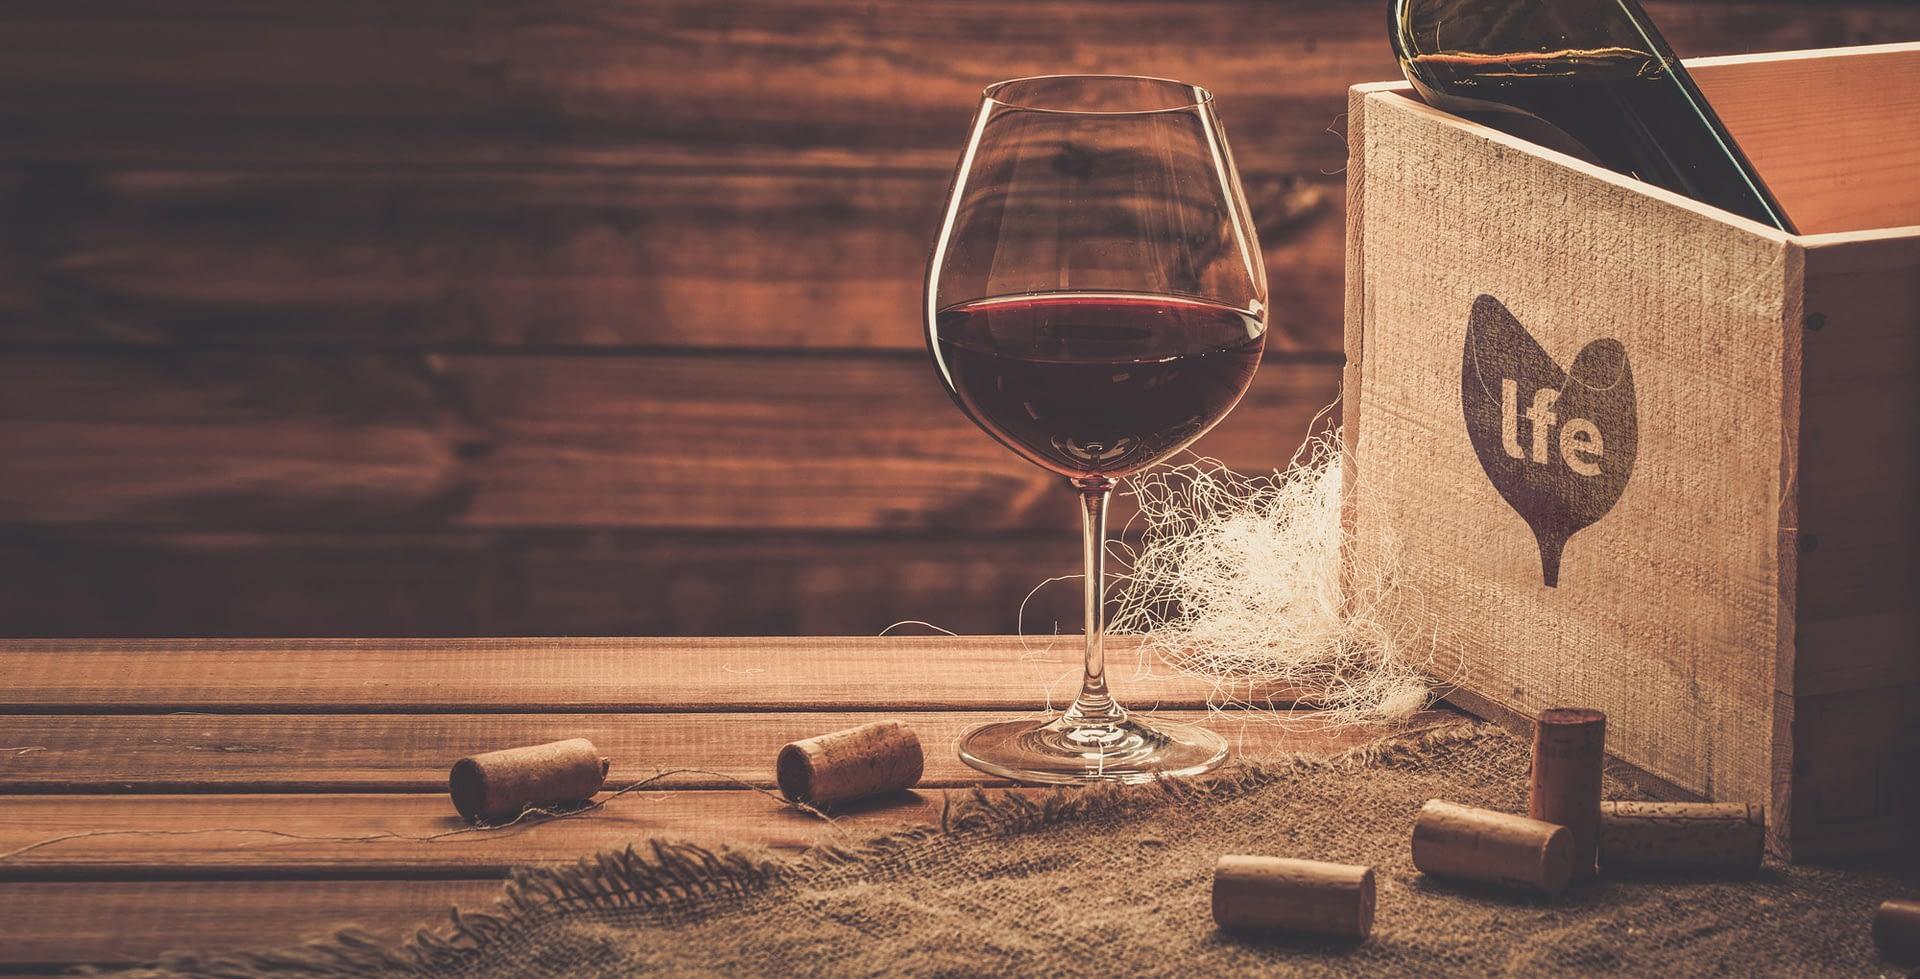 Coverfoto glas wijn